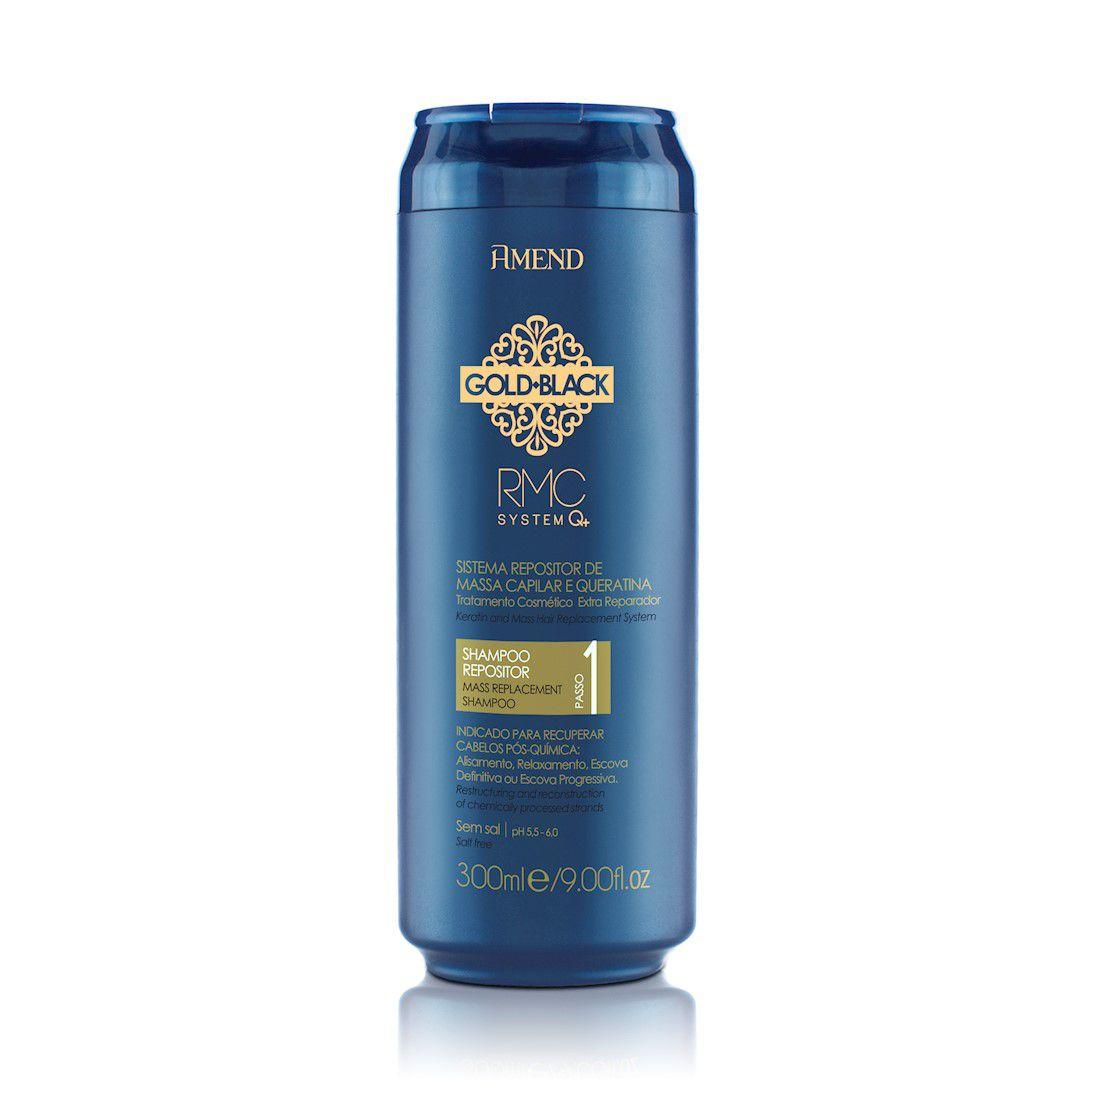 Amend Shampoo Gold Black RMC Q+ Passo 1 300mL